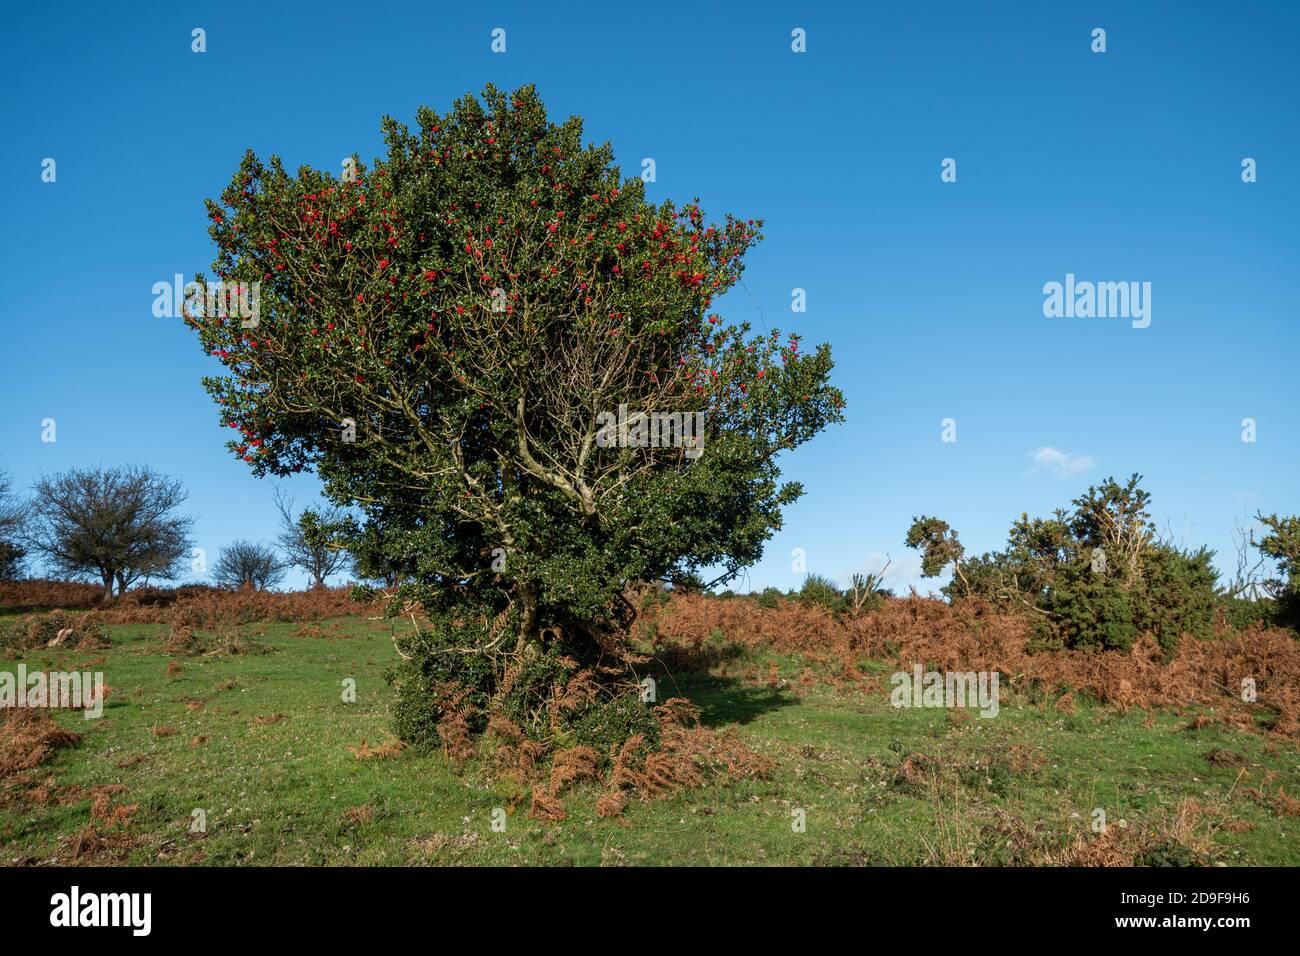 single-holly-tree-ilex-aquifolium-with-red-berries-in-november-uk-2D9F9H6.jpg